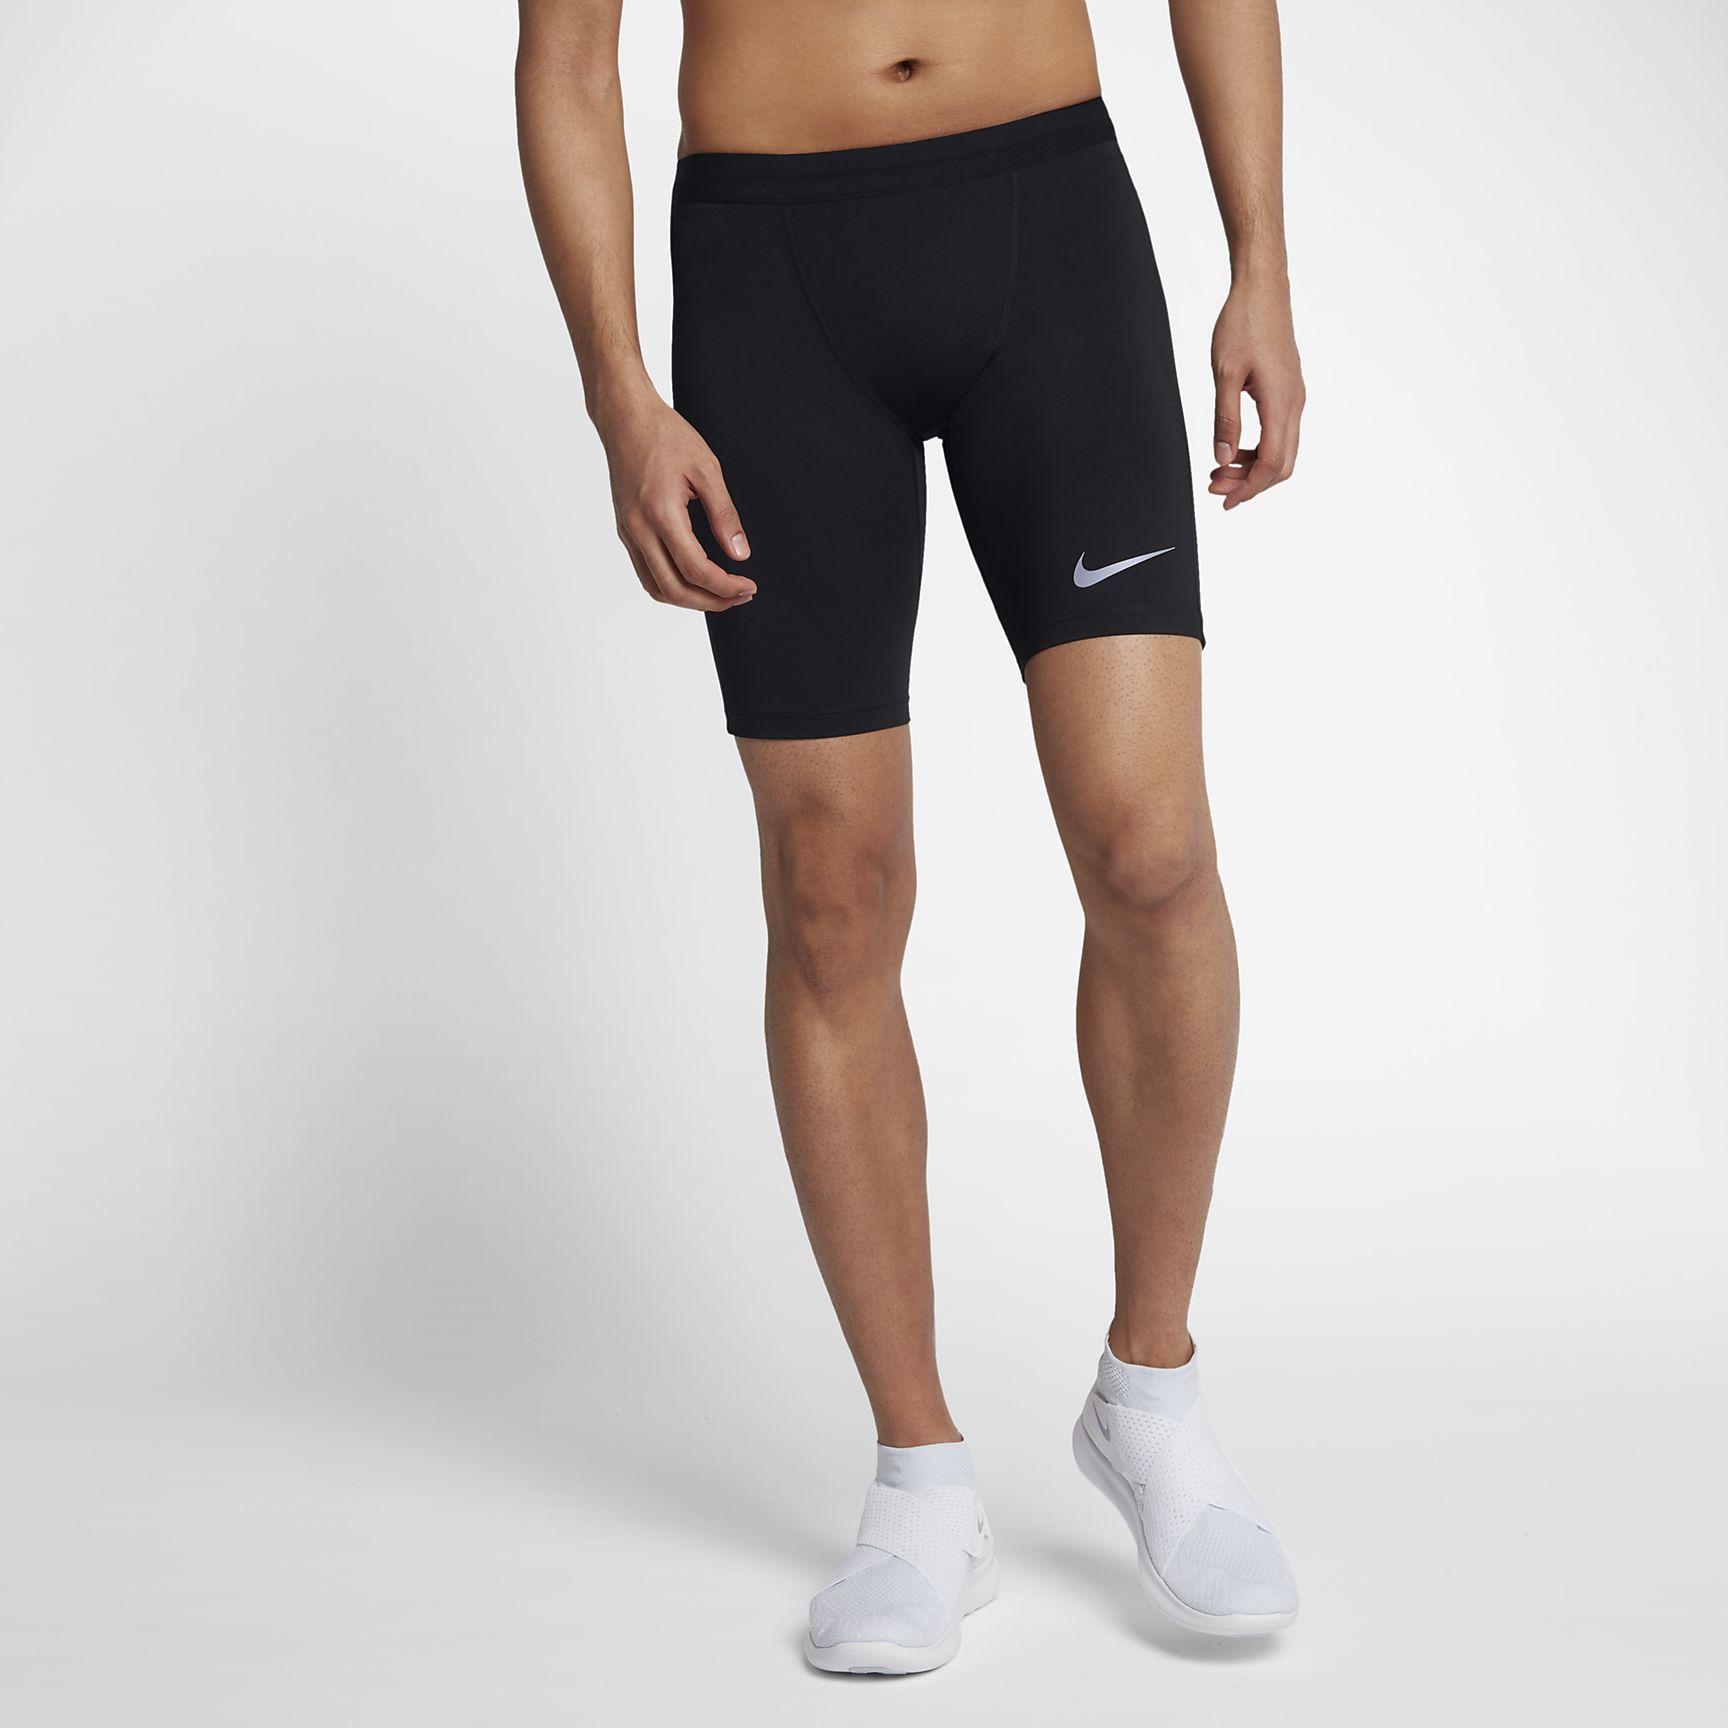 Nike Tech Tights kurz in Schwarz